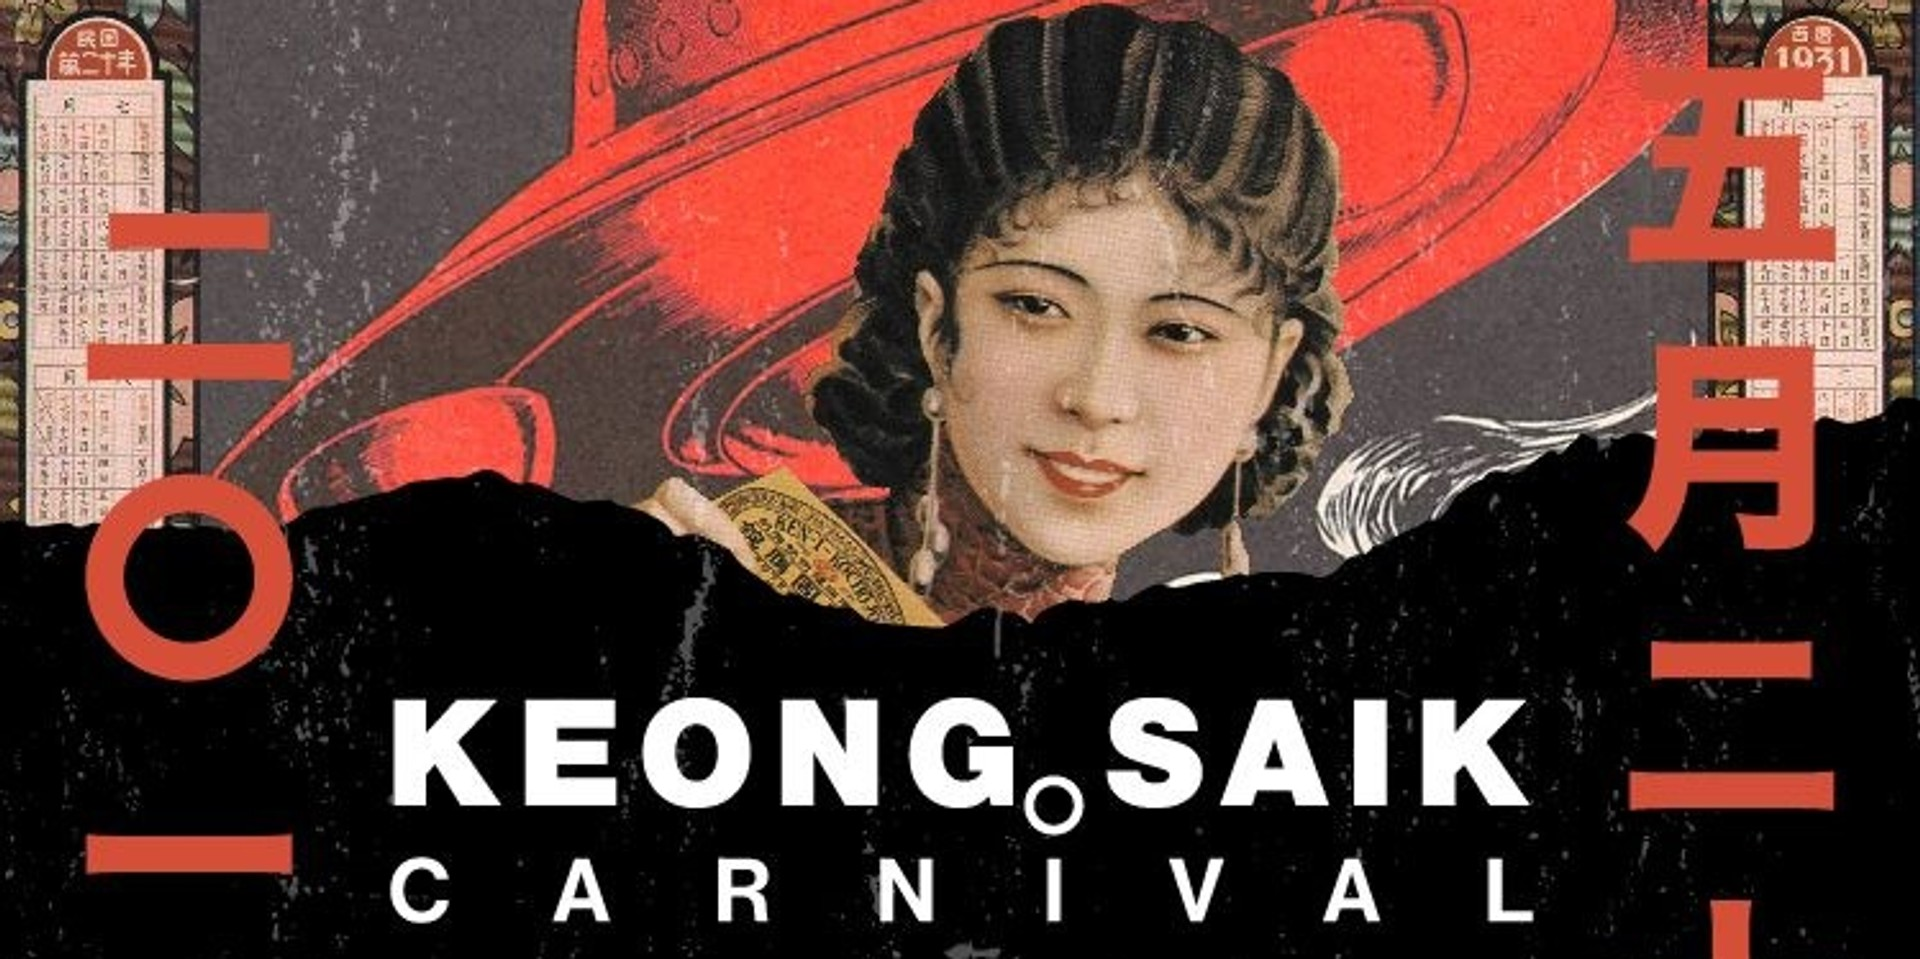 Keong Saik Carnival showcases the Chinese underground scene